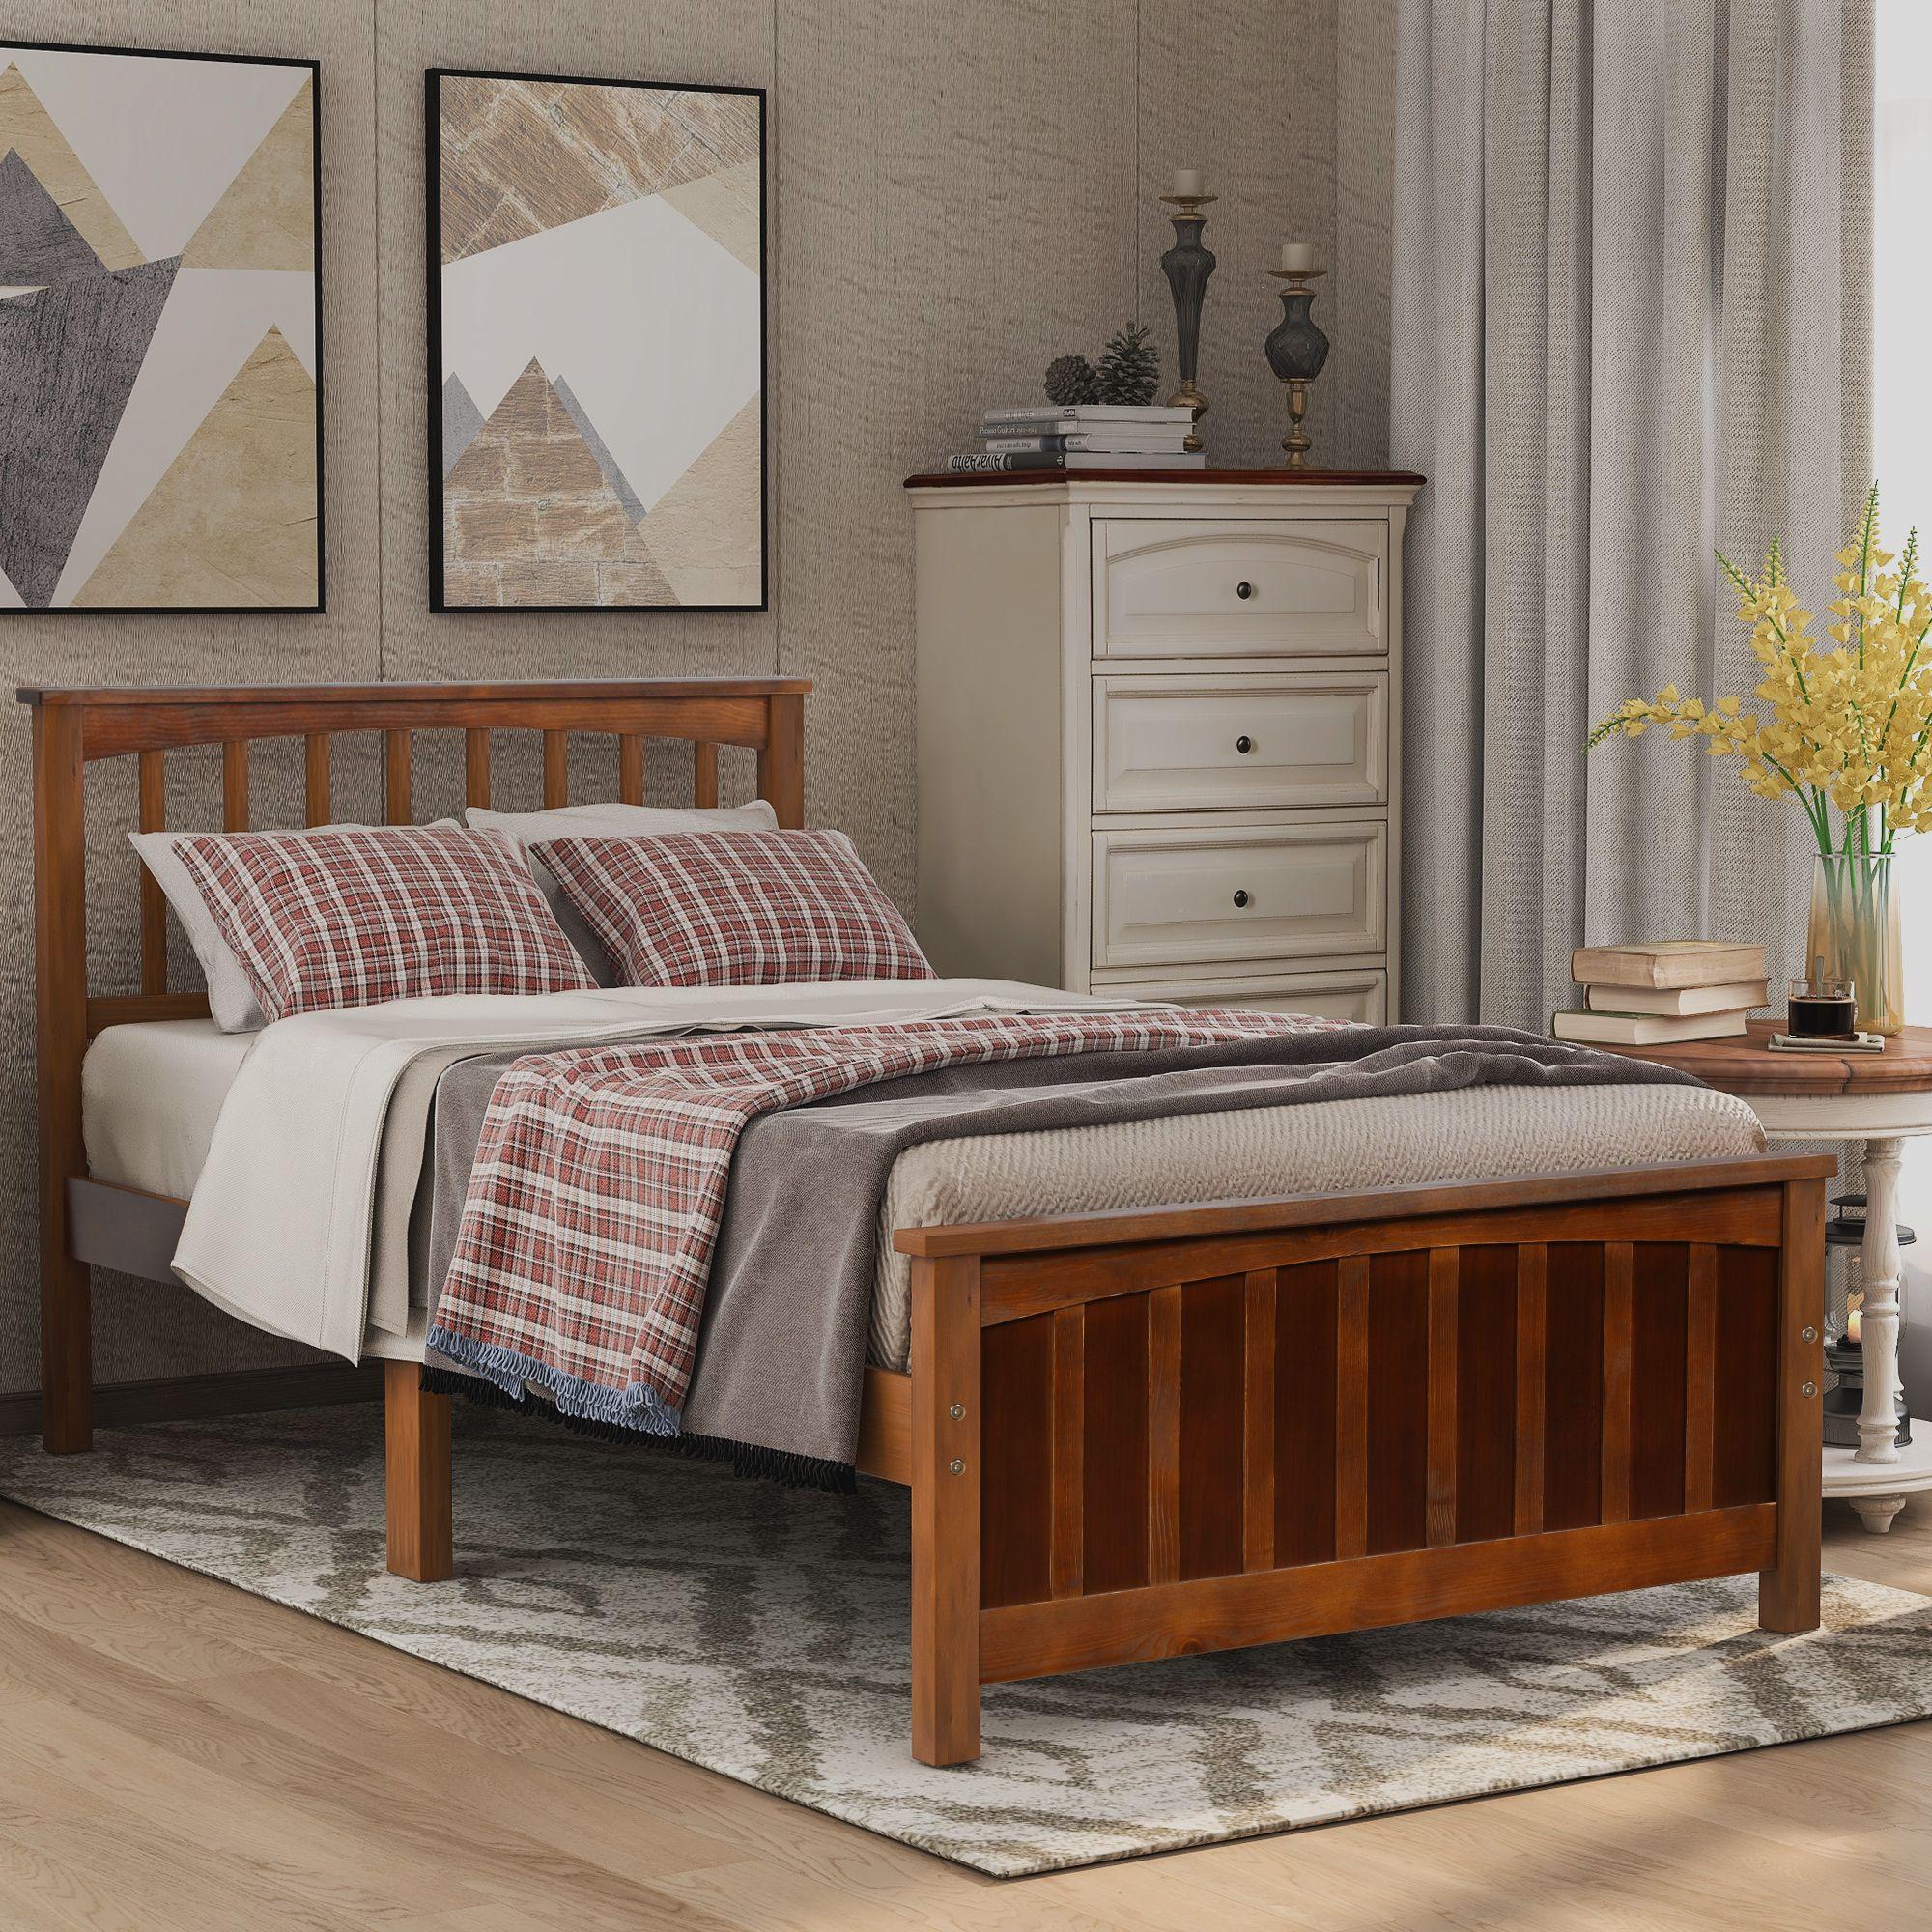 2020 Modern Wood Platform Bed Twin Size Bed Headboard Footboard Walnut White Espresso Bedroom Furniture Fast Shipping From Greatfurnishing 175 48 Dhgate Com